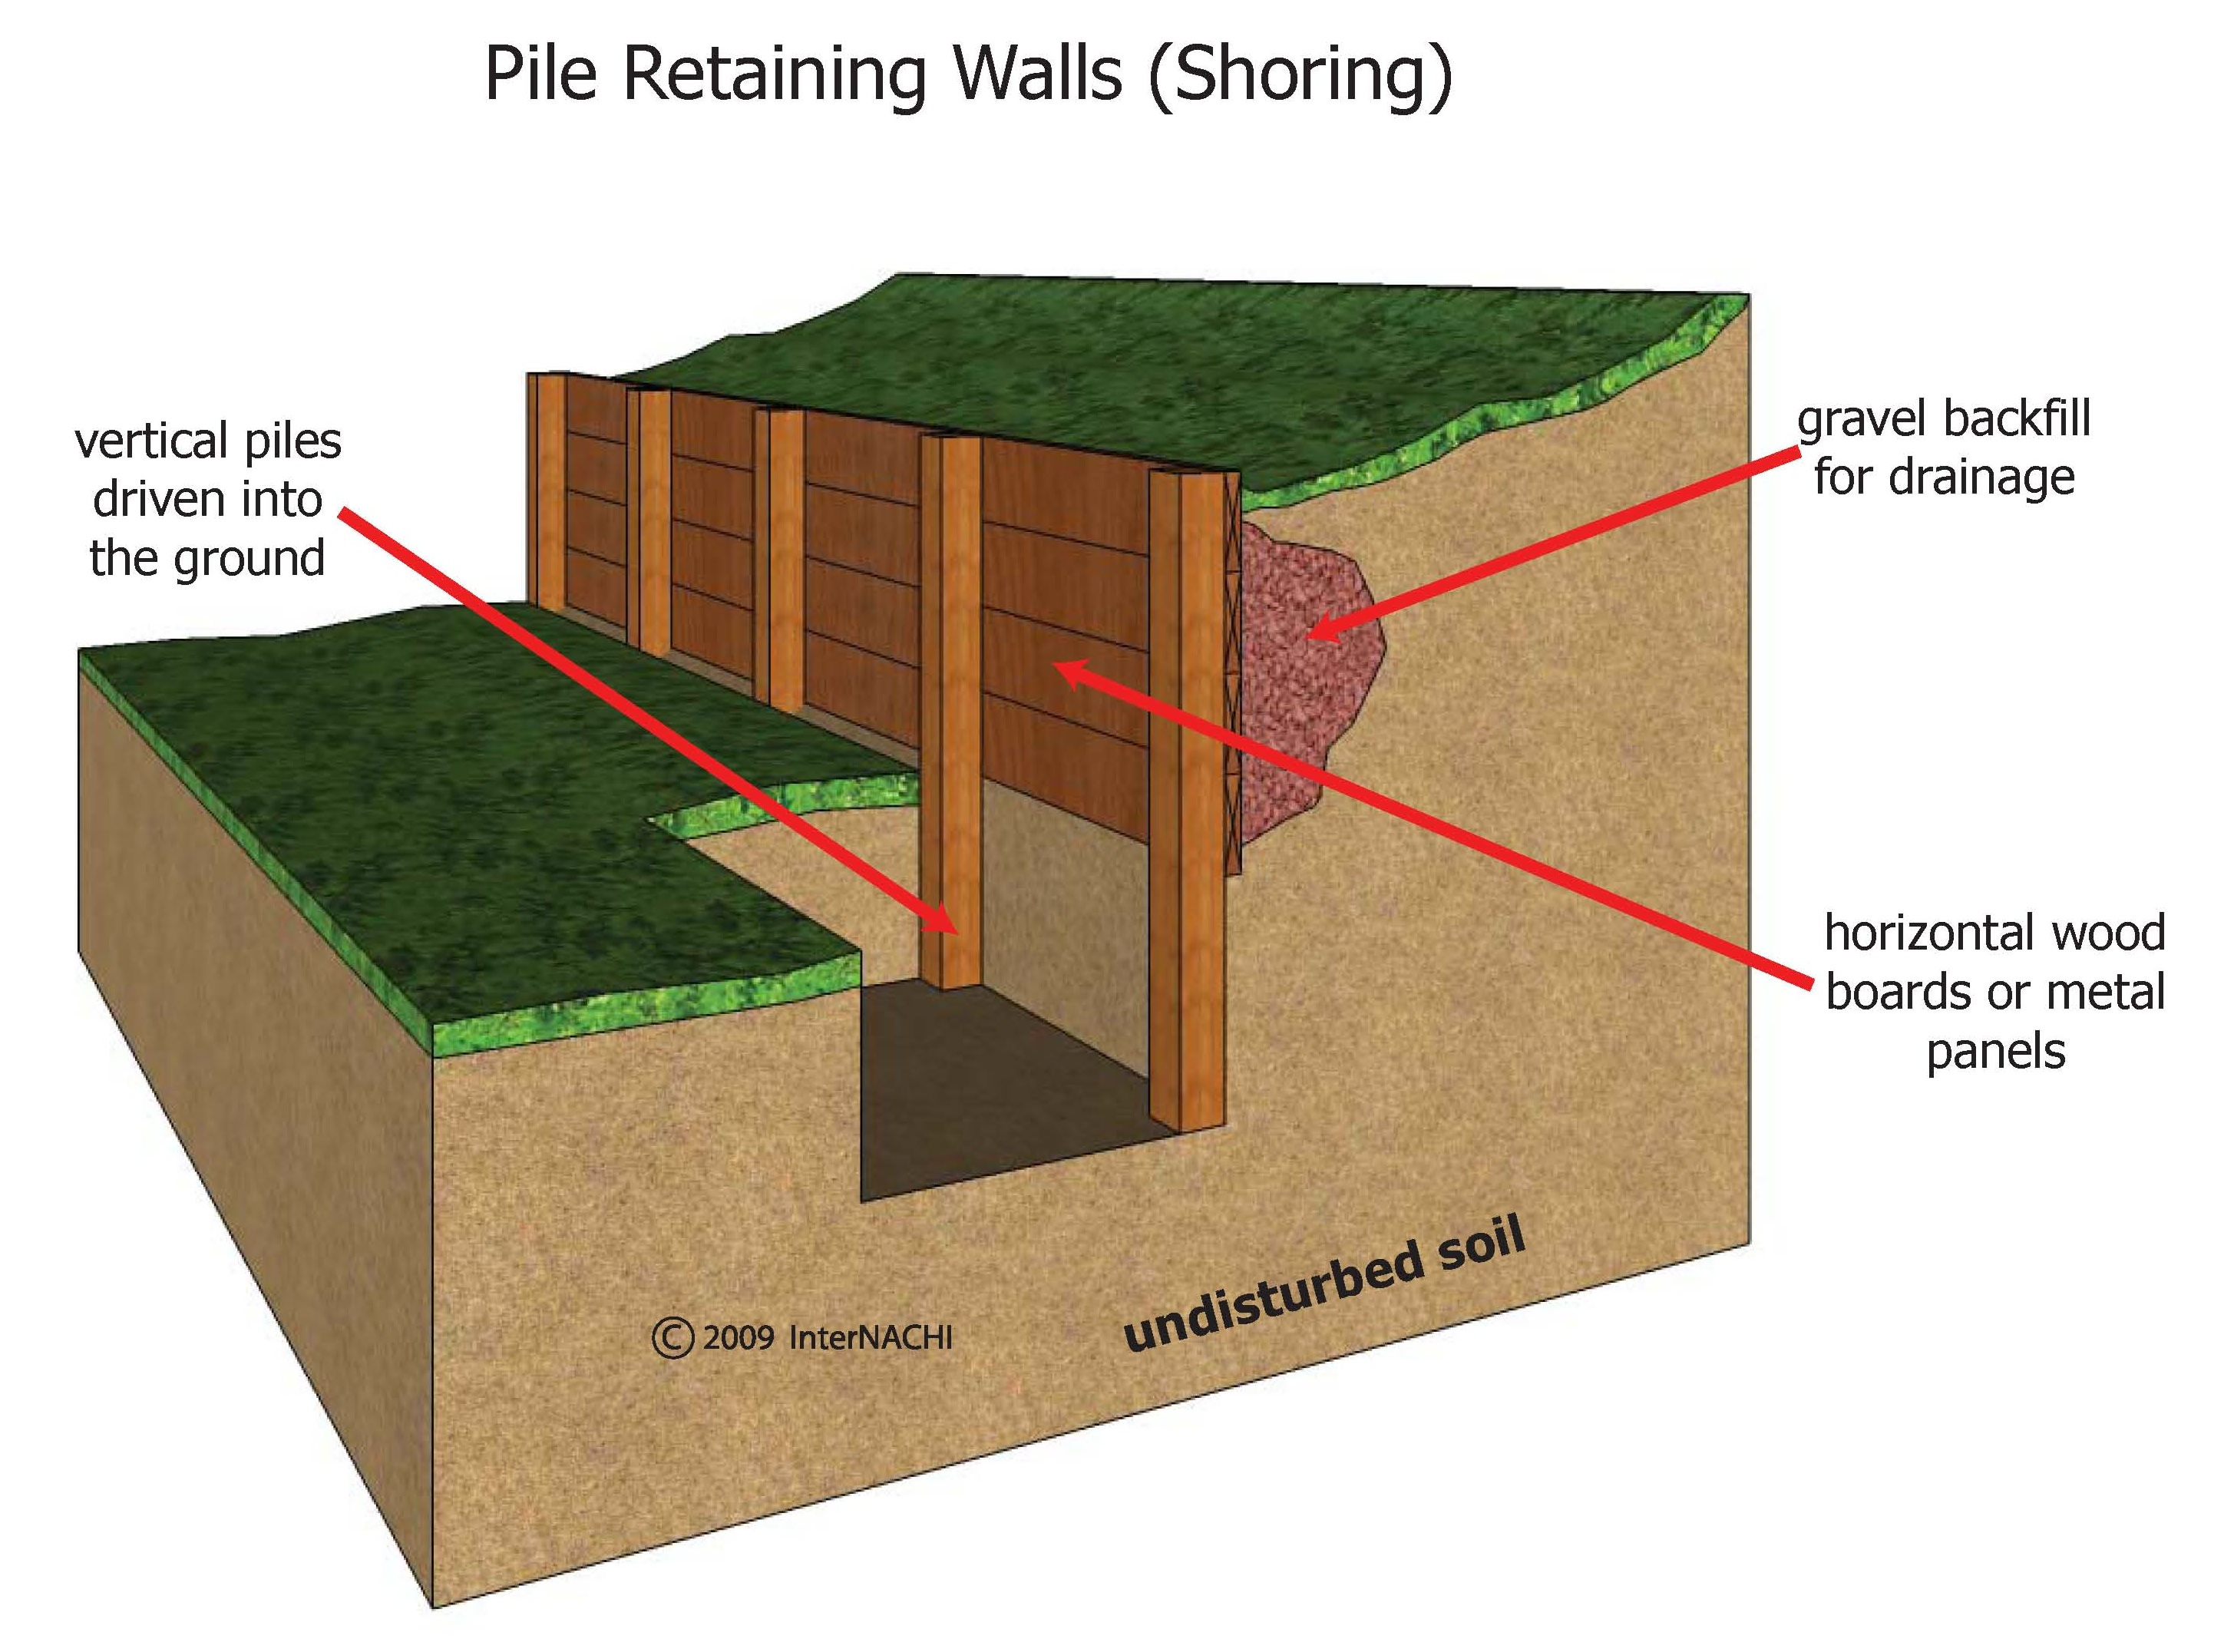 Pile retaining wall.